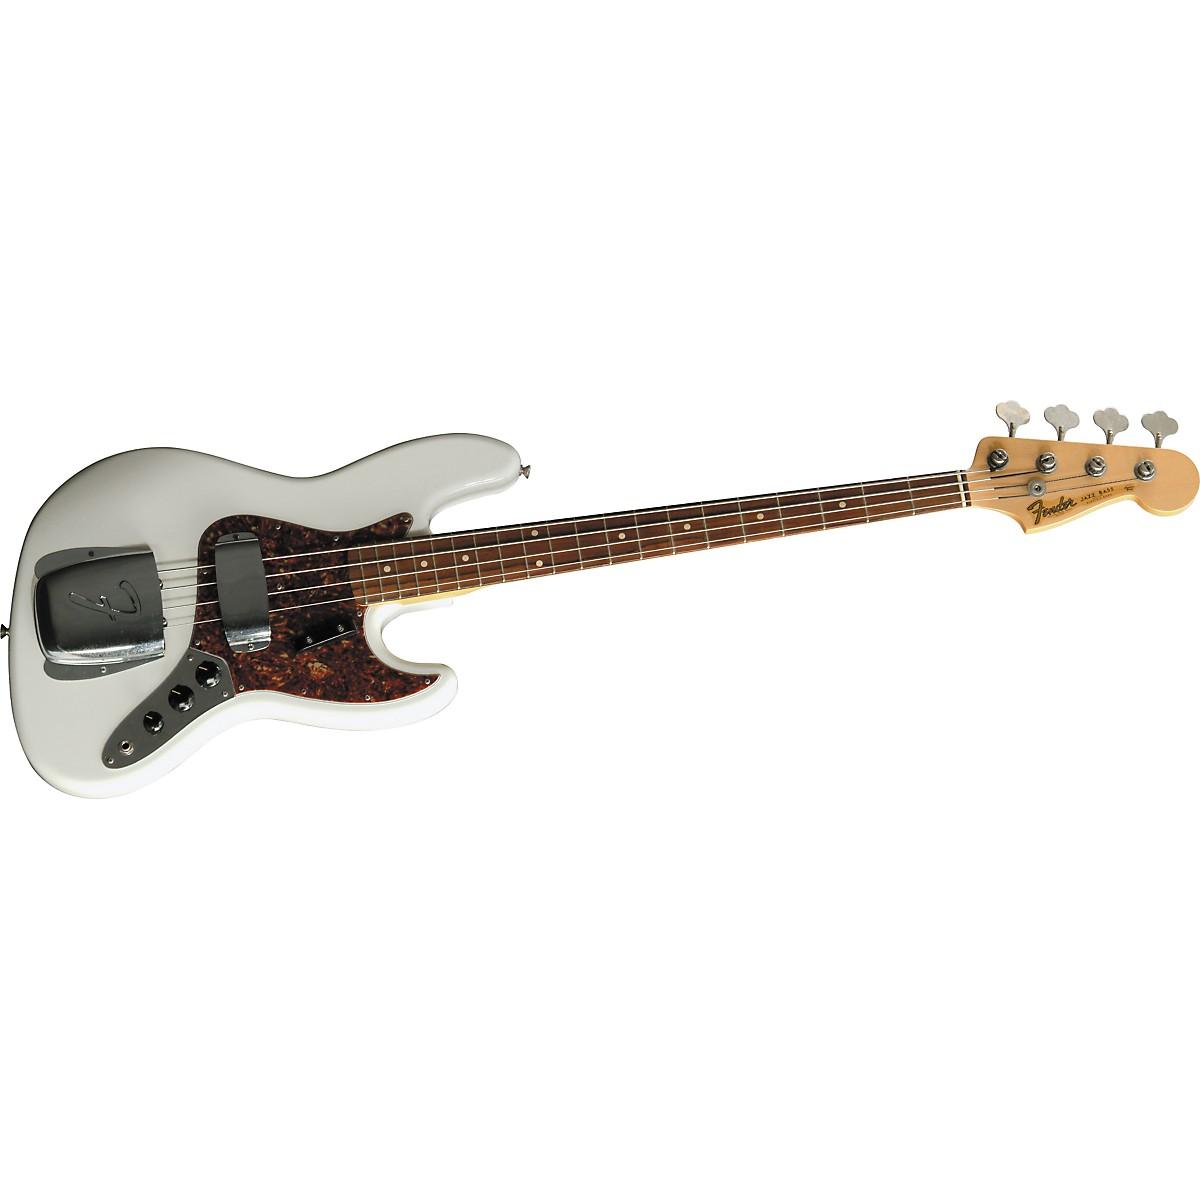 Fender Custom Shop '64 Jazz Bass Closet Classic